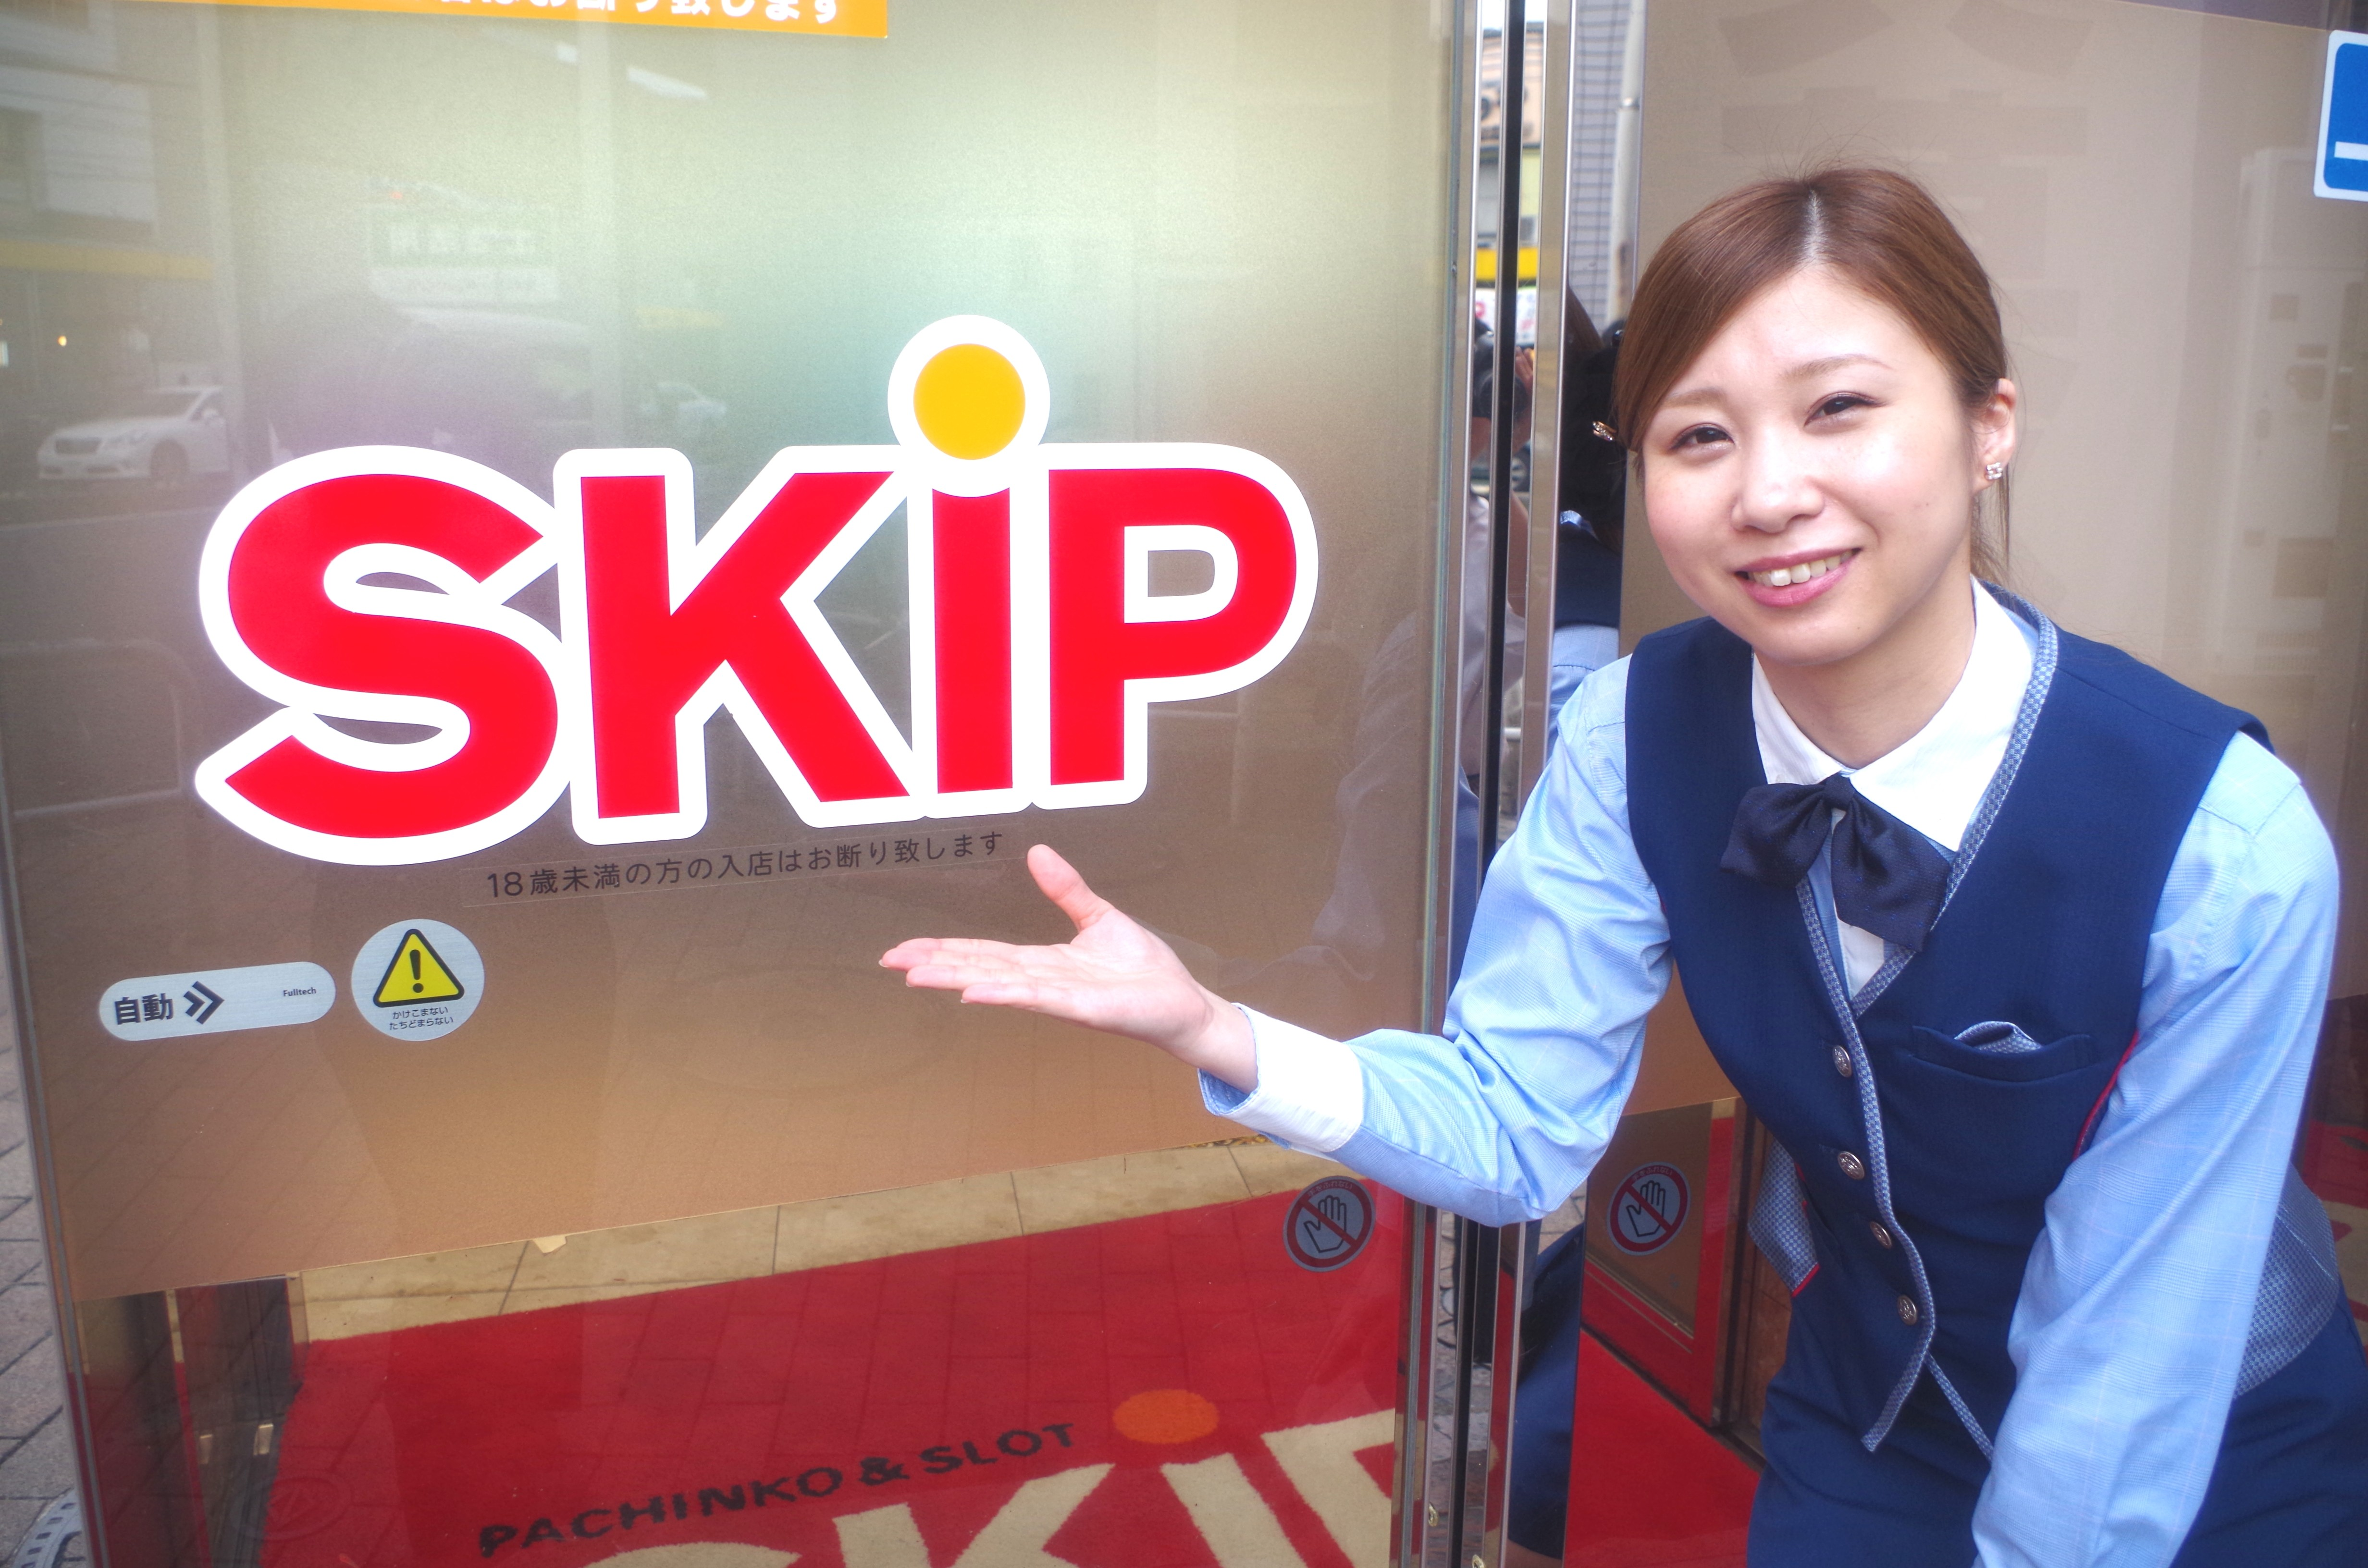 SKIP(スキップ) 六角橋店 のアルバイト情報